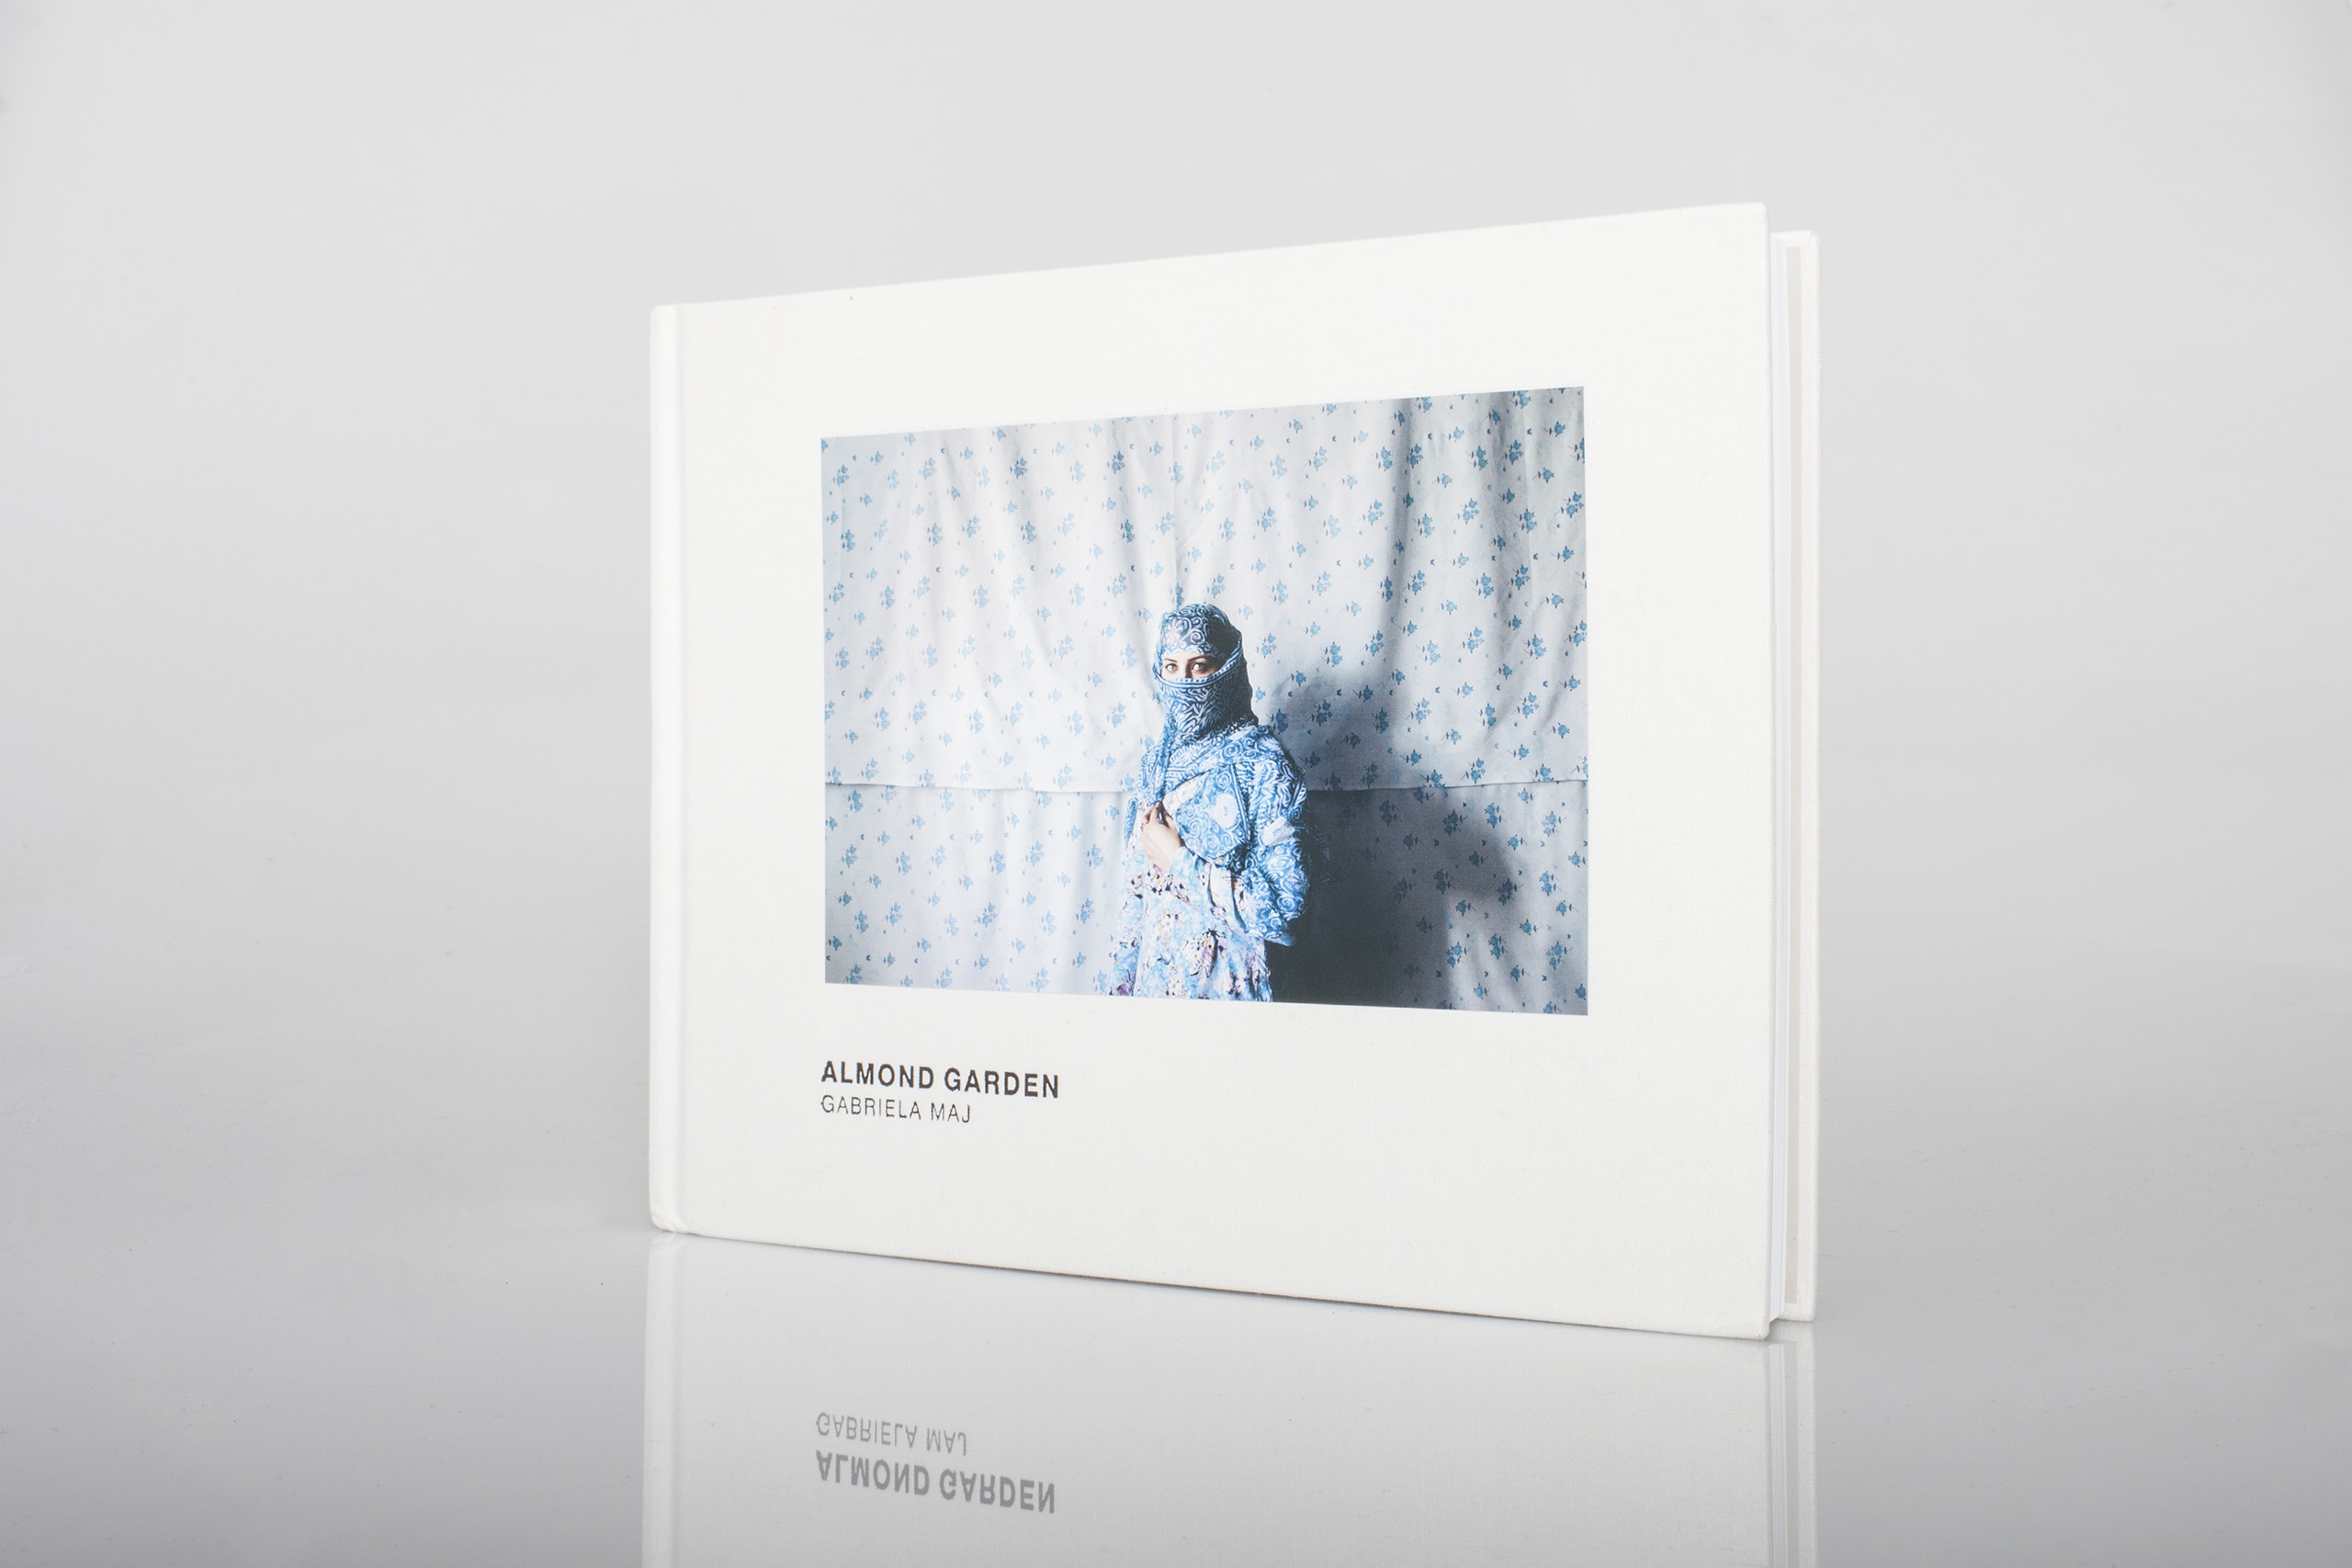 Almond Garden  by Gabriela MajPublished by Daylight Books